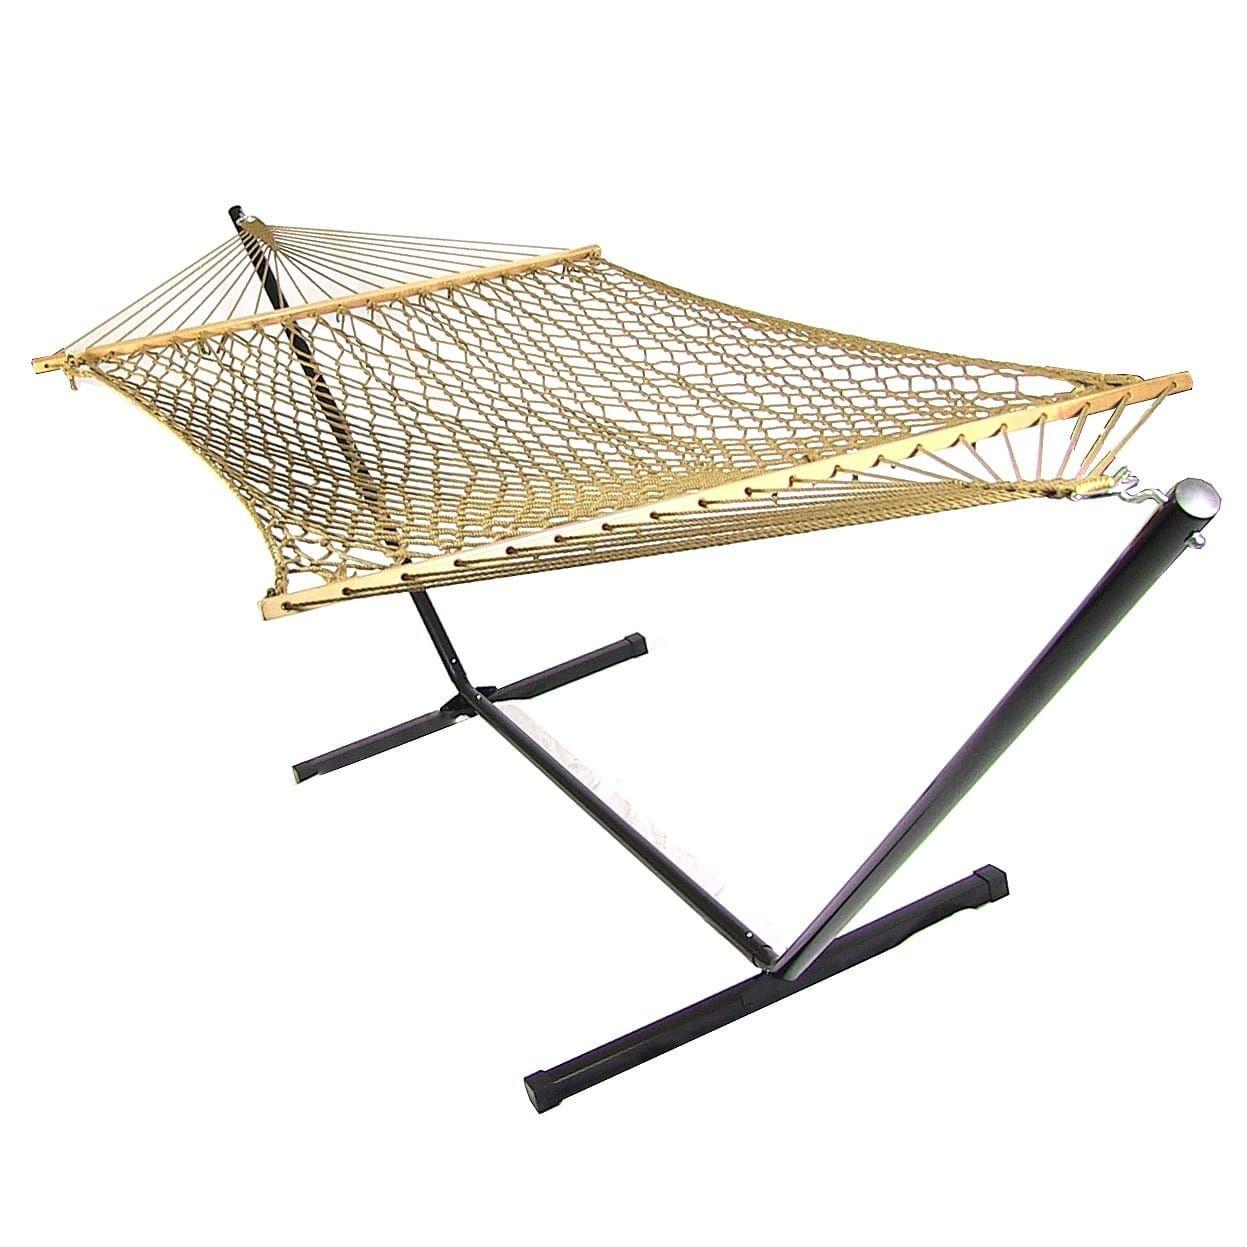 Sunnydaze caribbean xl rope hammock with spreader bars u hammock